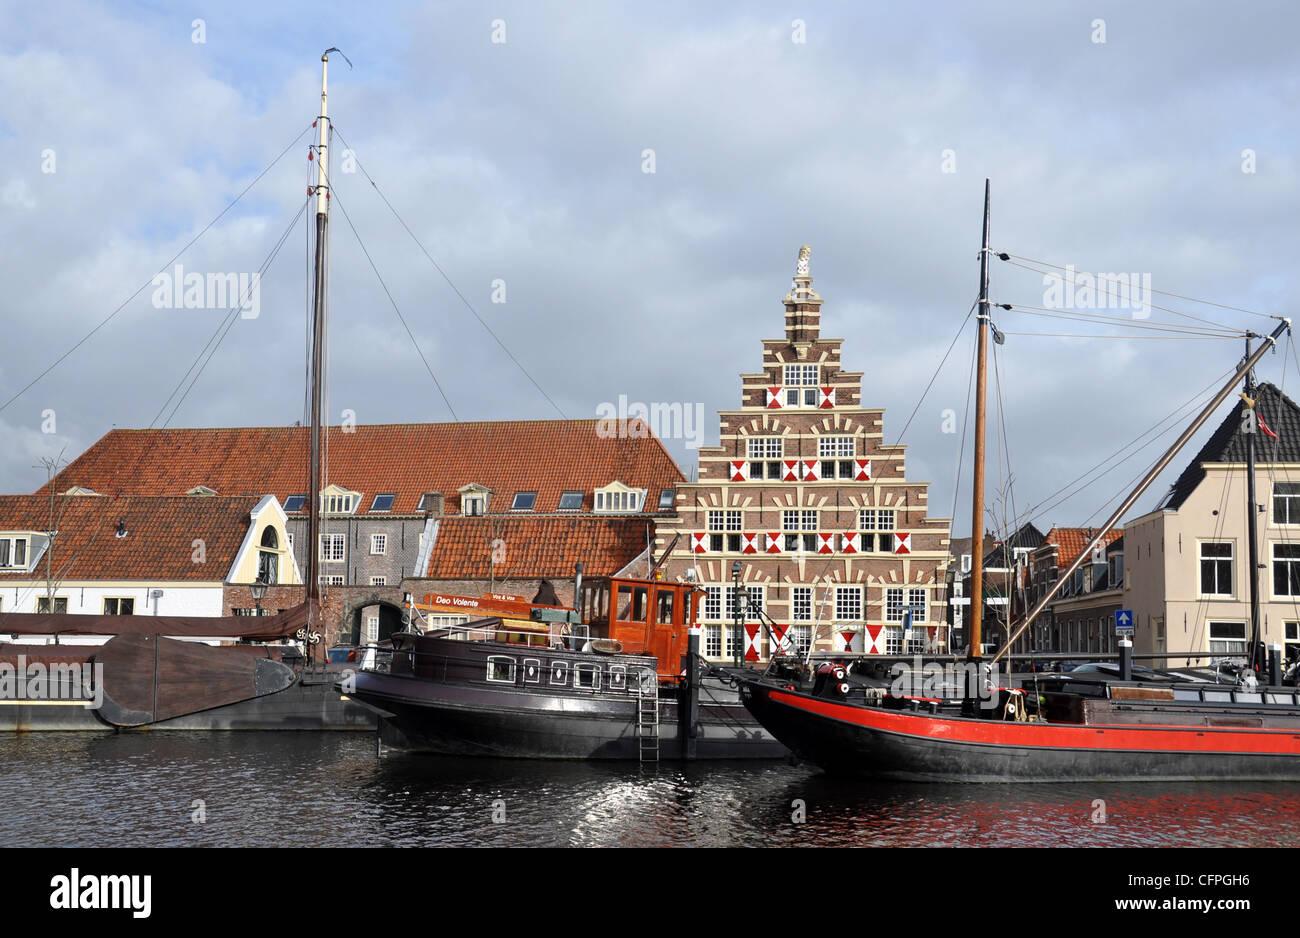 Historical carpenters wharf, Leiden, Netherlands - Stock Image